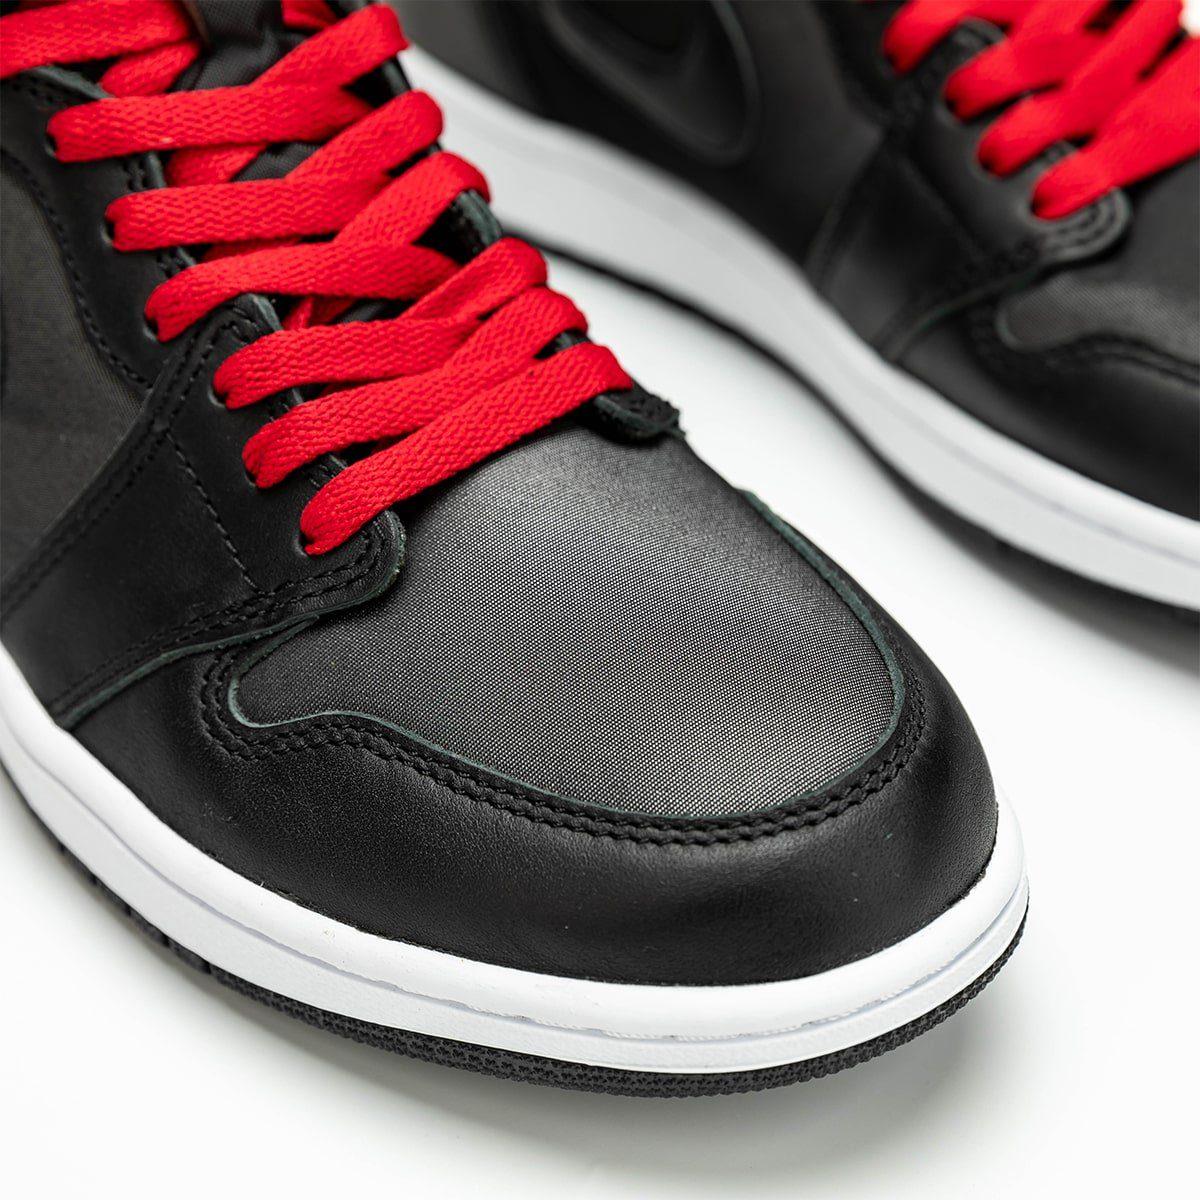 Official Look at the Air Jordan 1 Retro High OG Black Satin